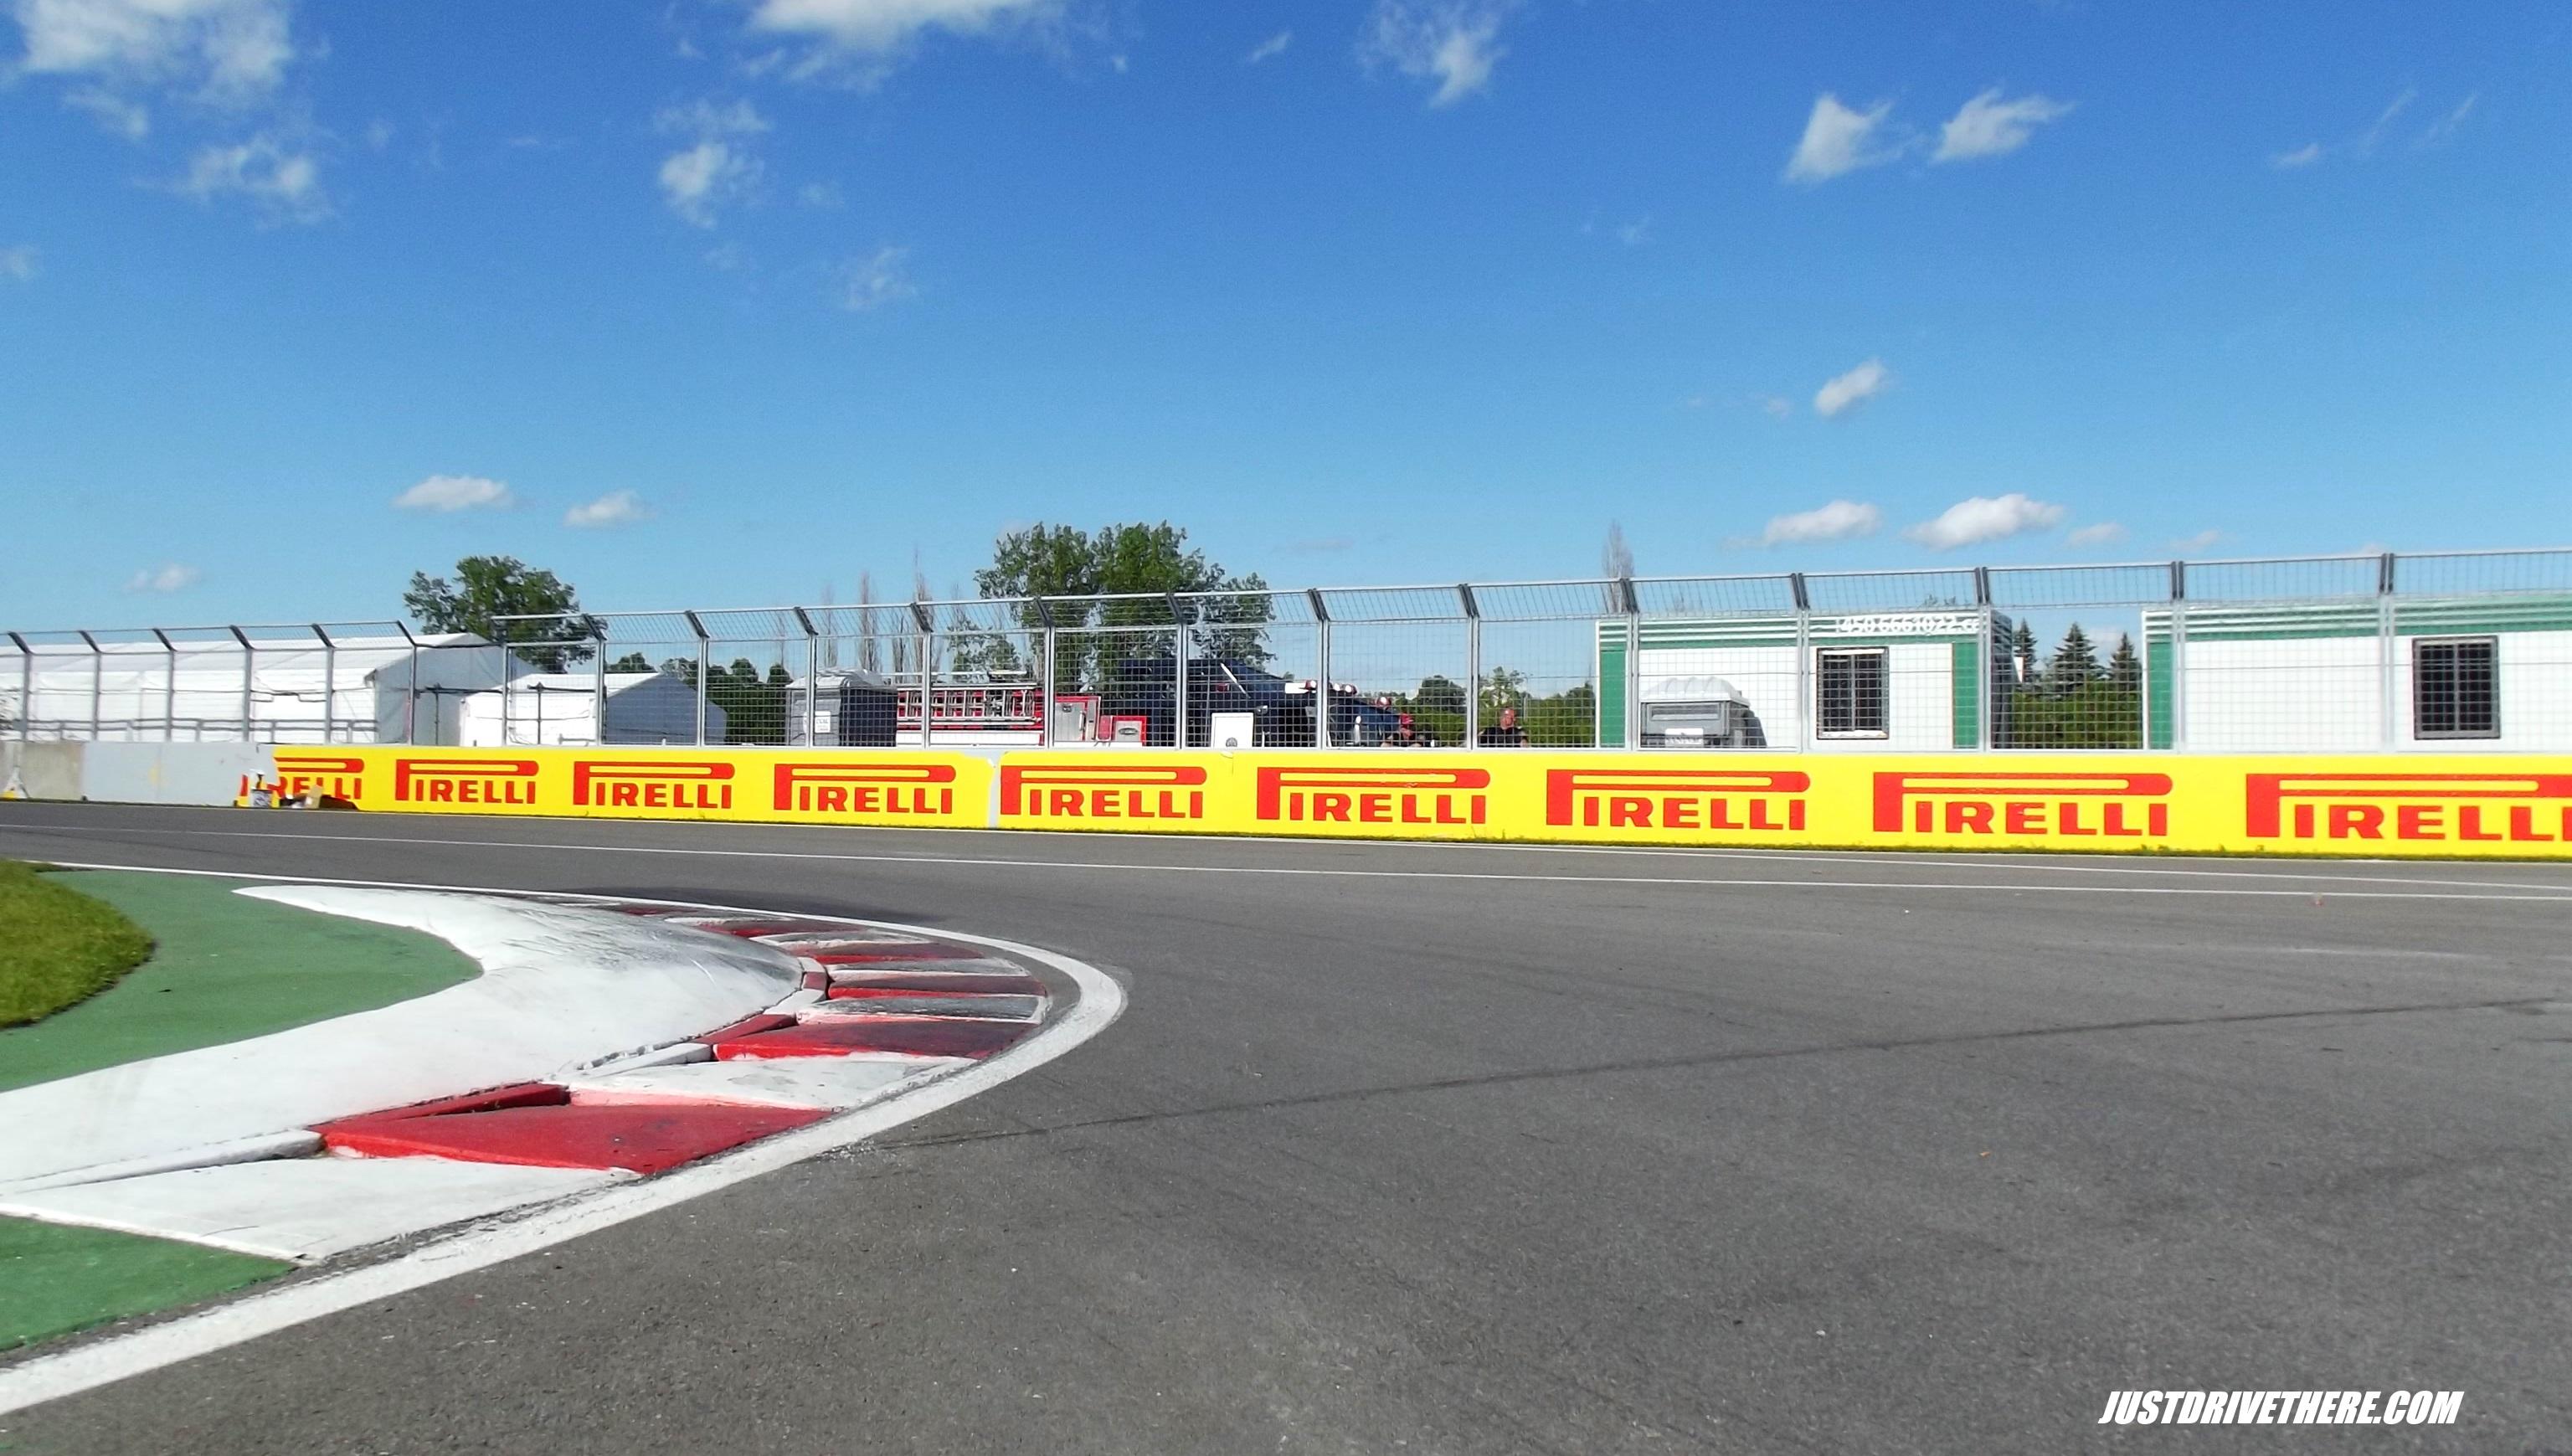 2013 Canada Grand Prix Justdrive There